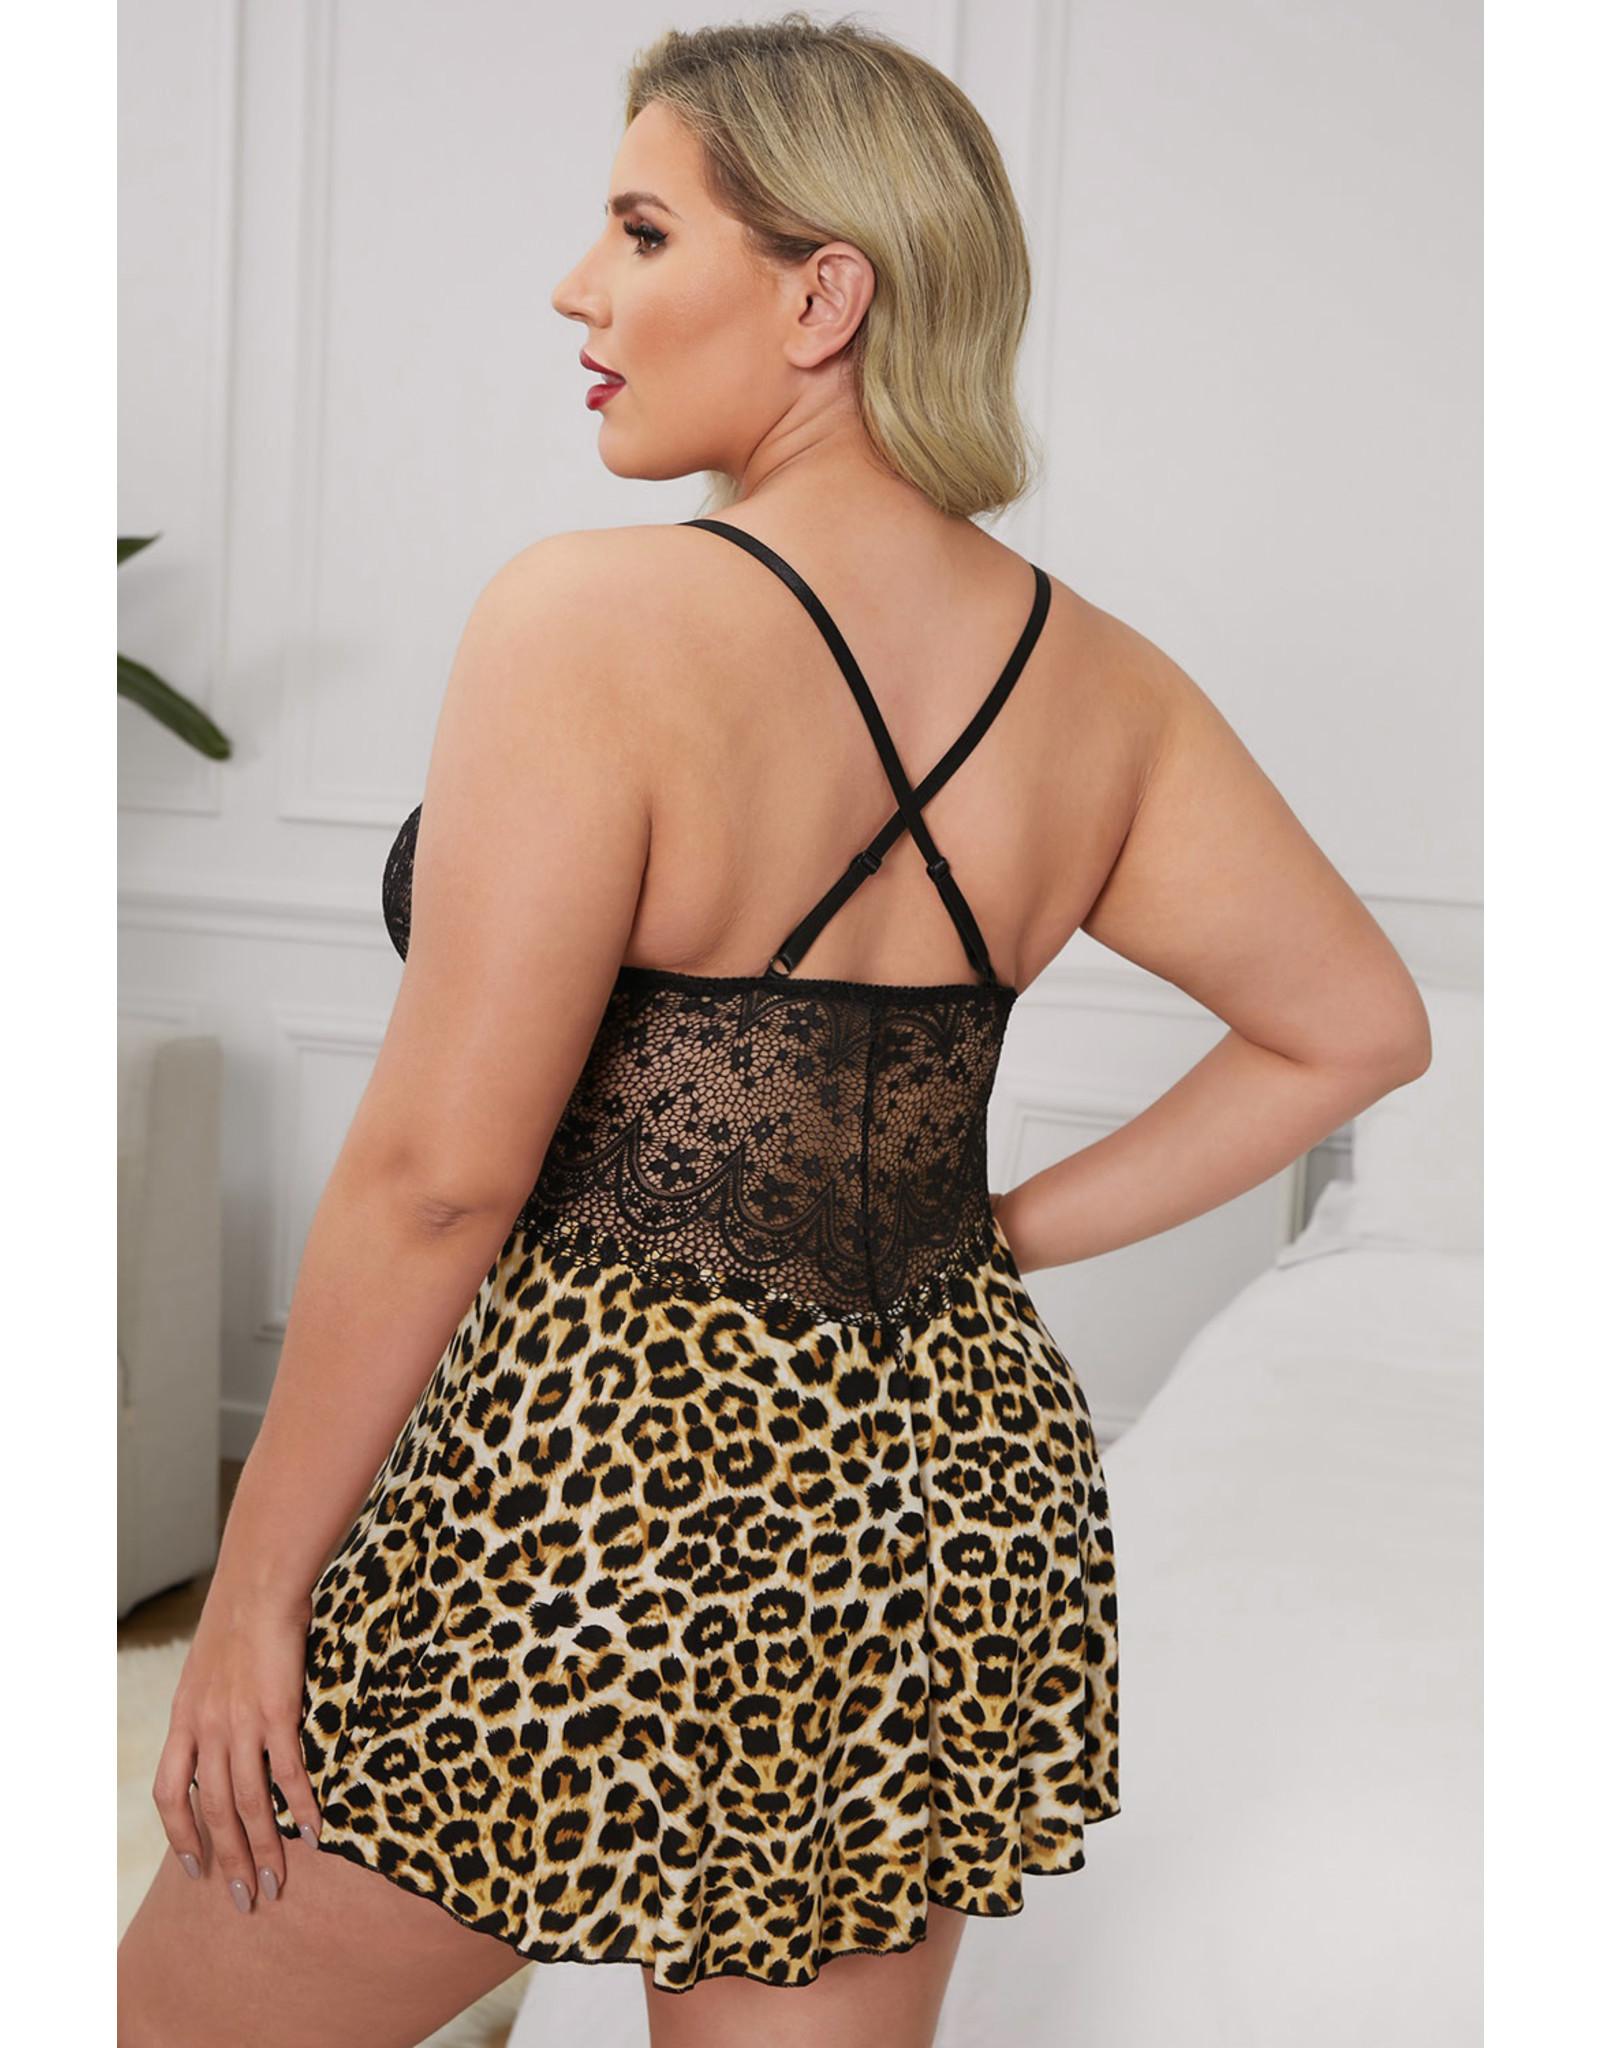 Babylon Cheetah Crochet Lace Backless Cami L